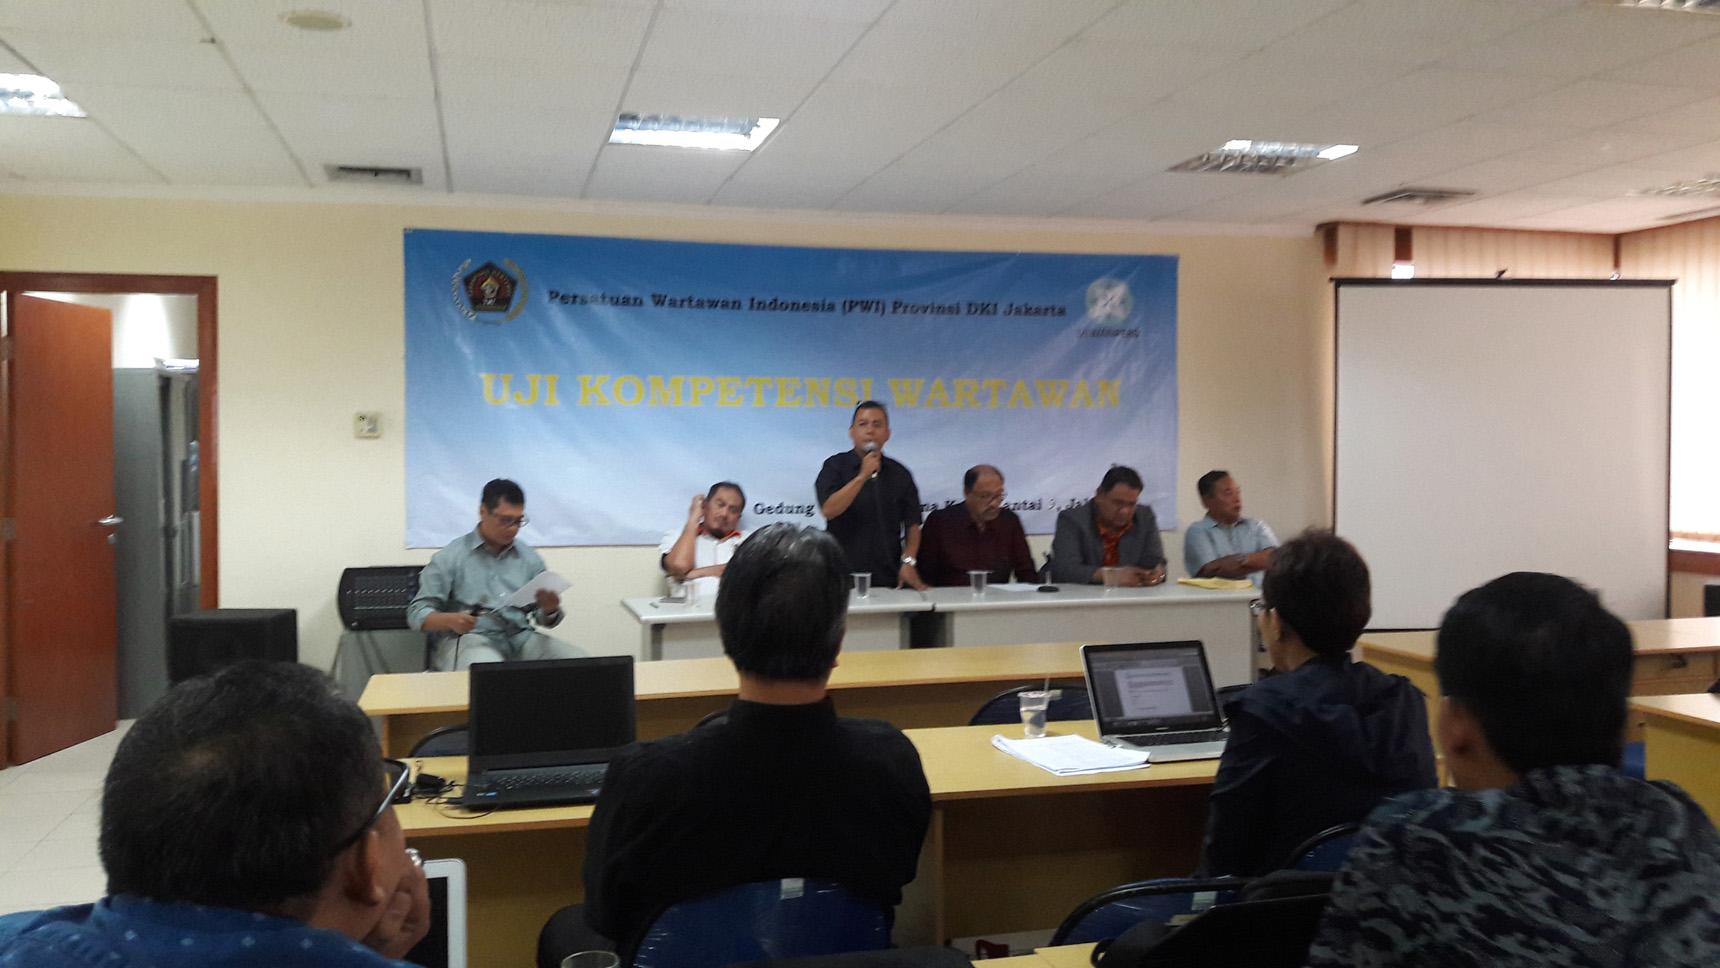 Seluruh Peserta UKW PWI DKI Jakarta Angkatan ke-29 Dinyatakan Kompeten